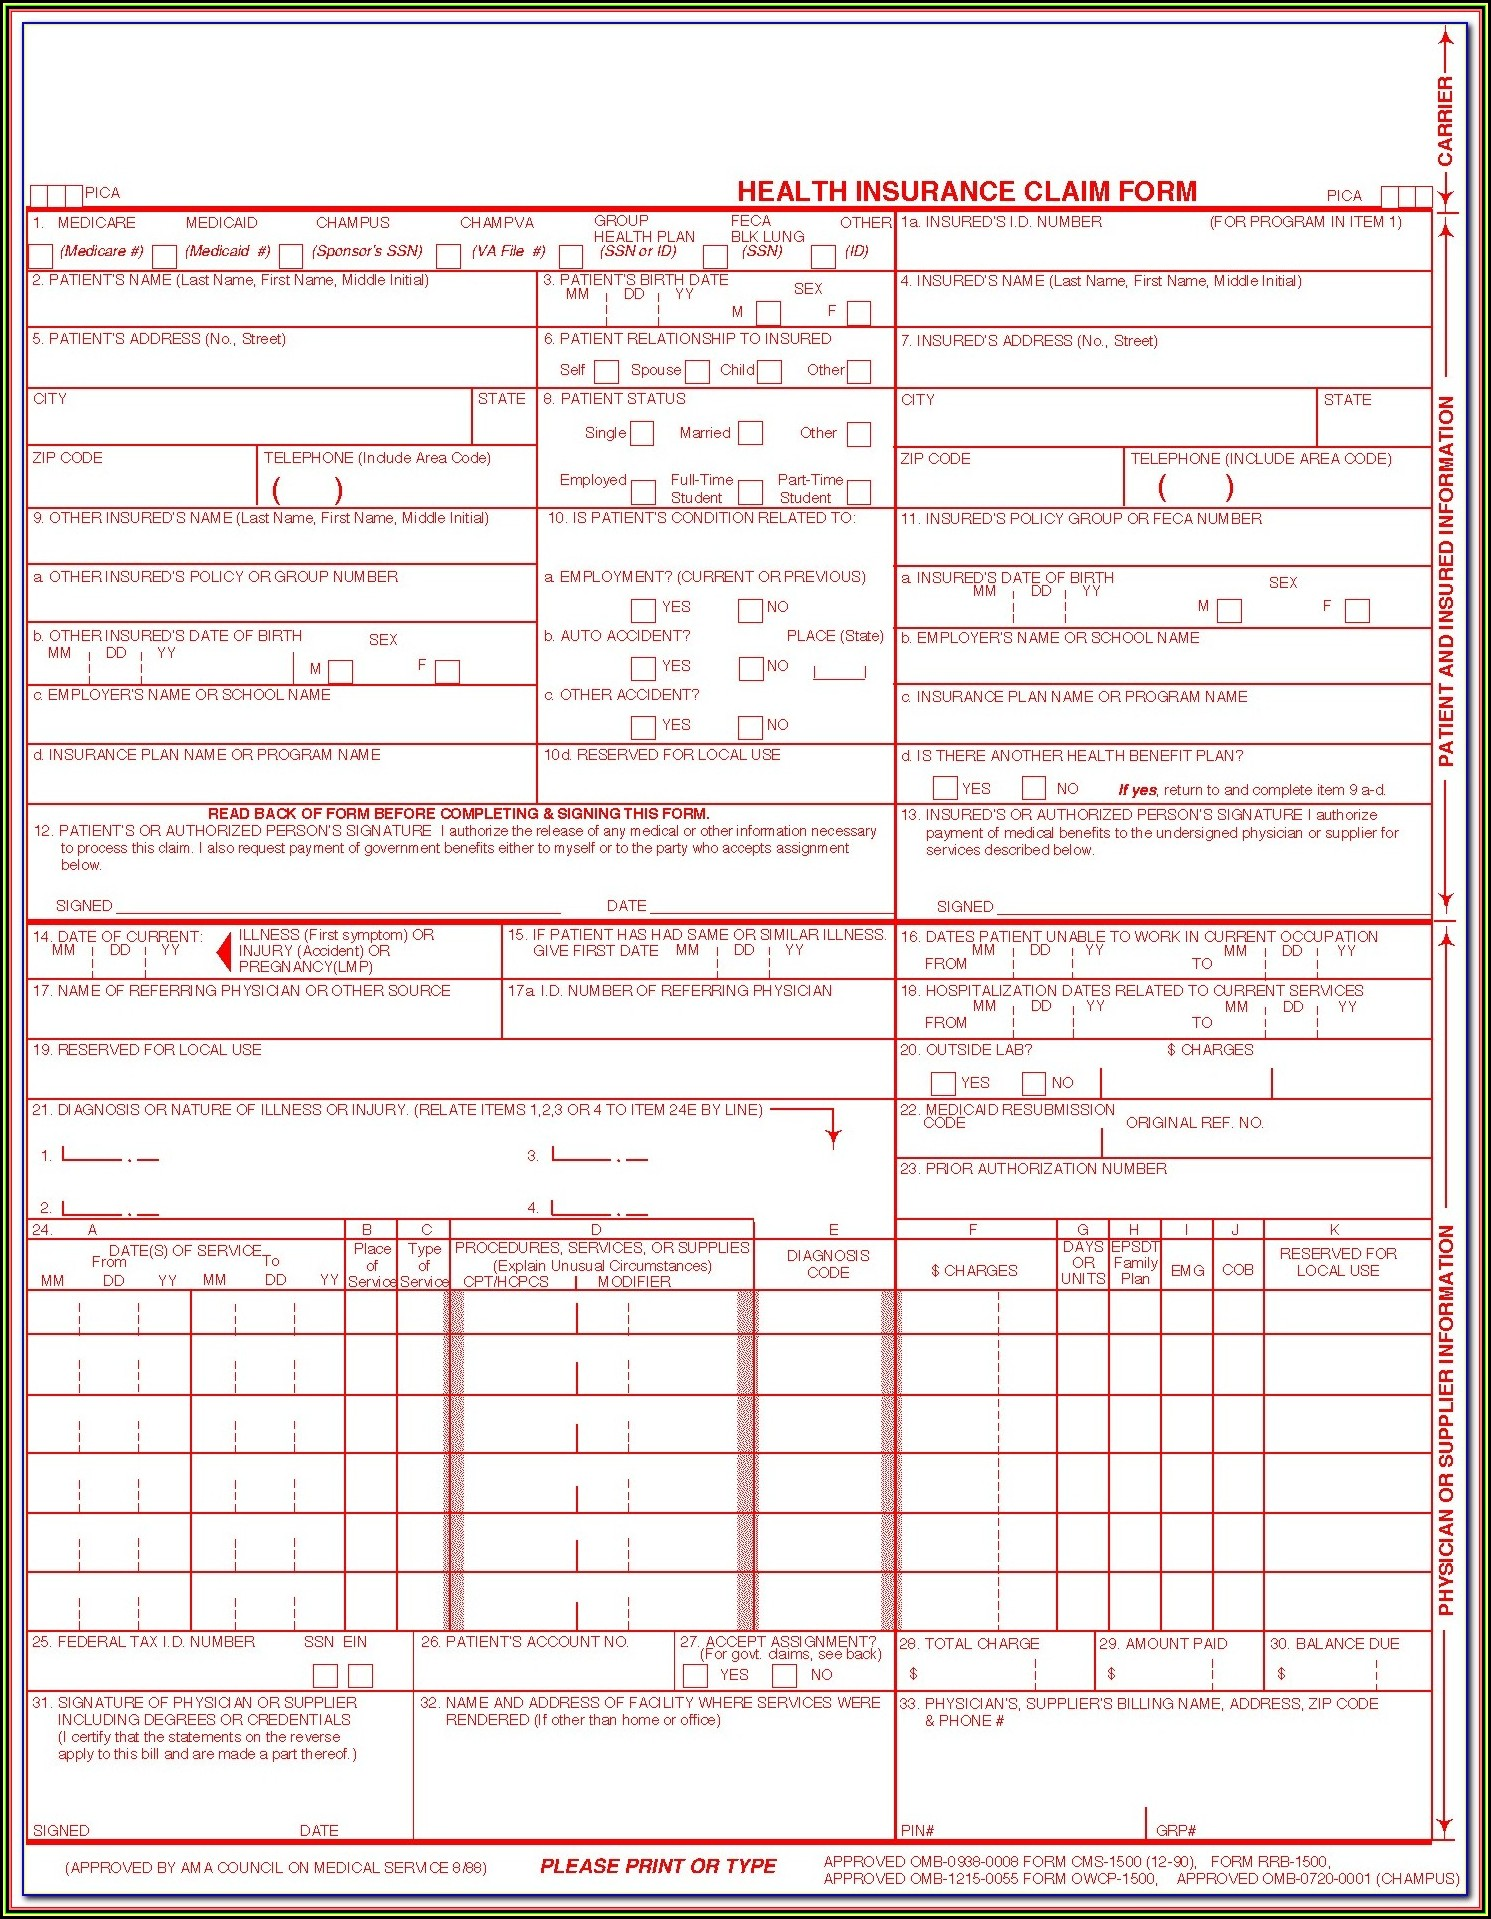 Blank Cms 1500 Form Pdf Download